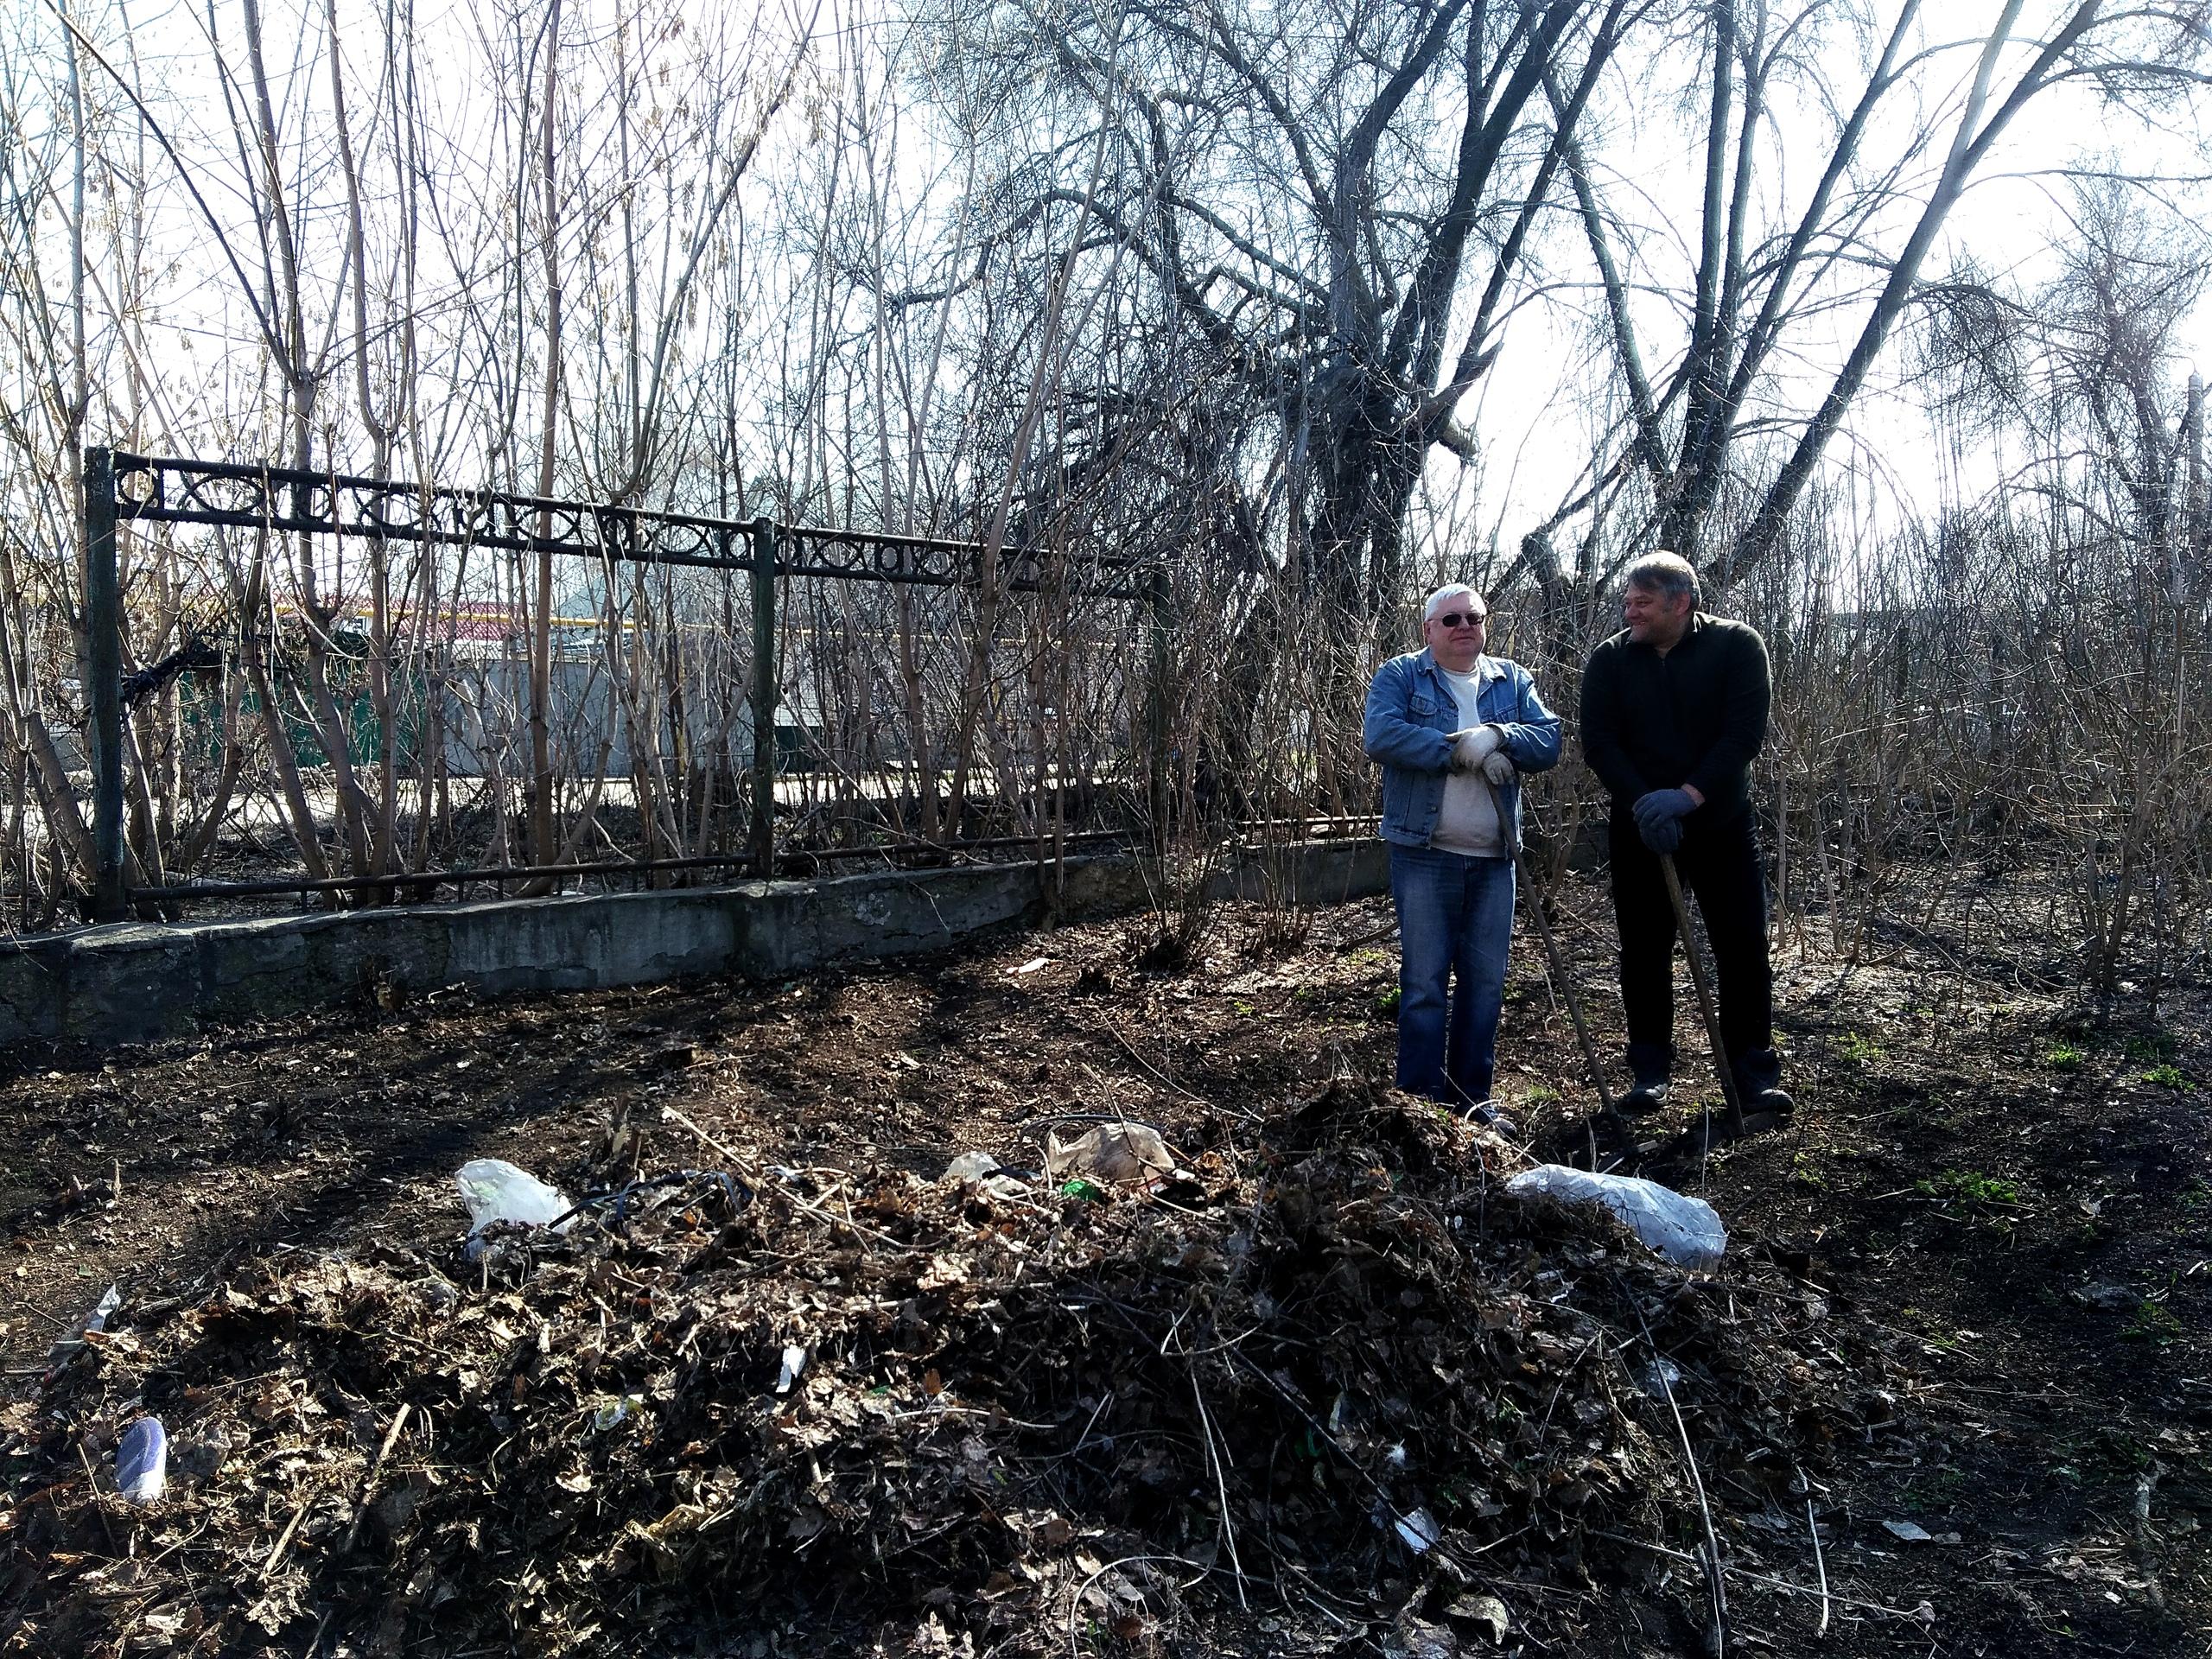 2019 КПРФ Тимирязевский парк